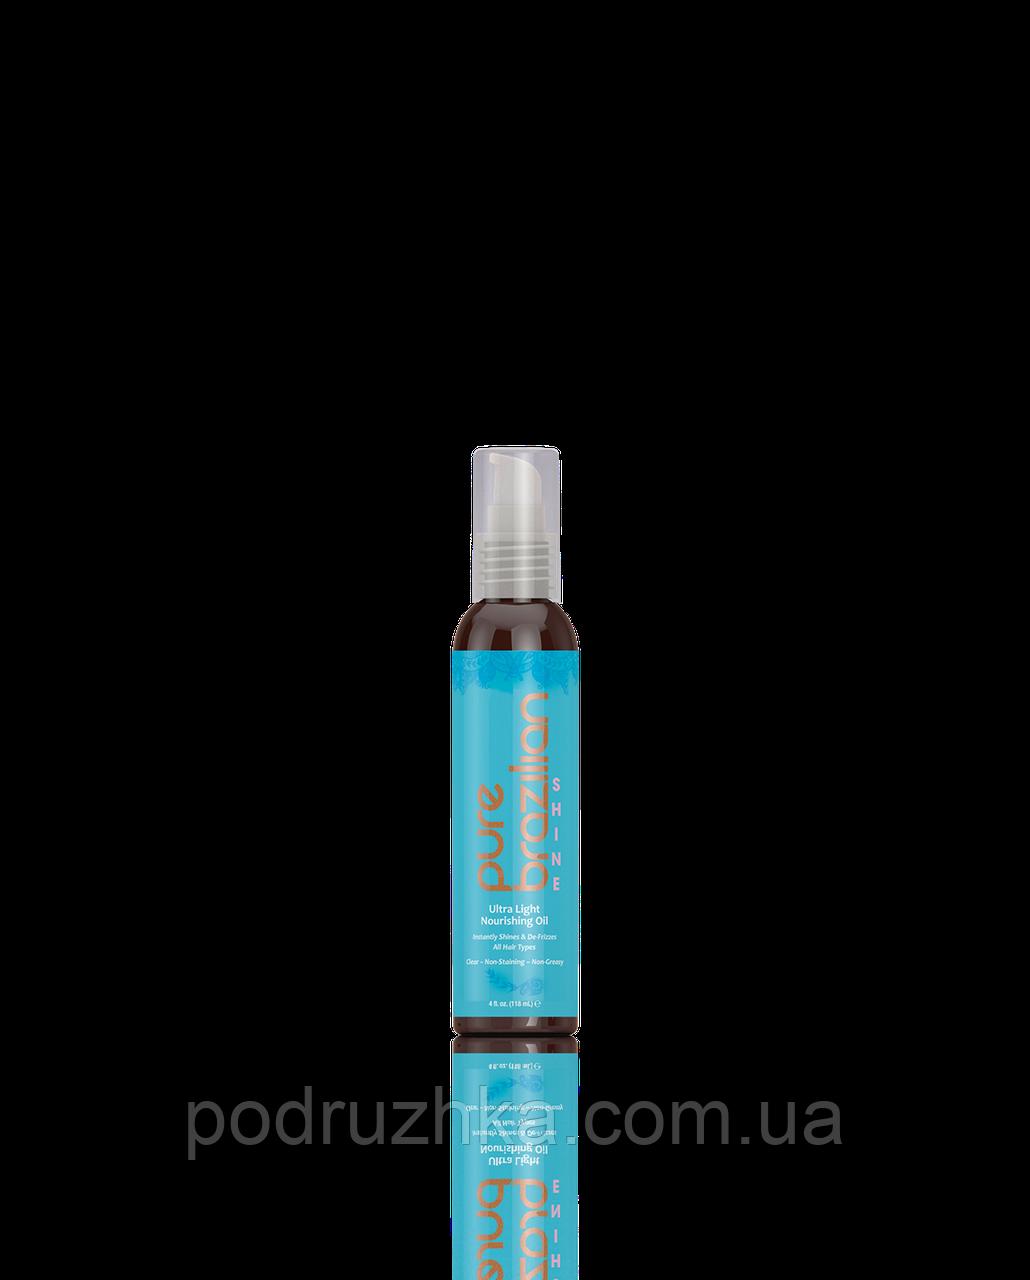 Pure Brazilian SHINE Ultra Light Nourishing Oil Ультра легкое масло для волос, 15 мл